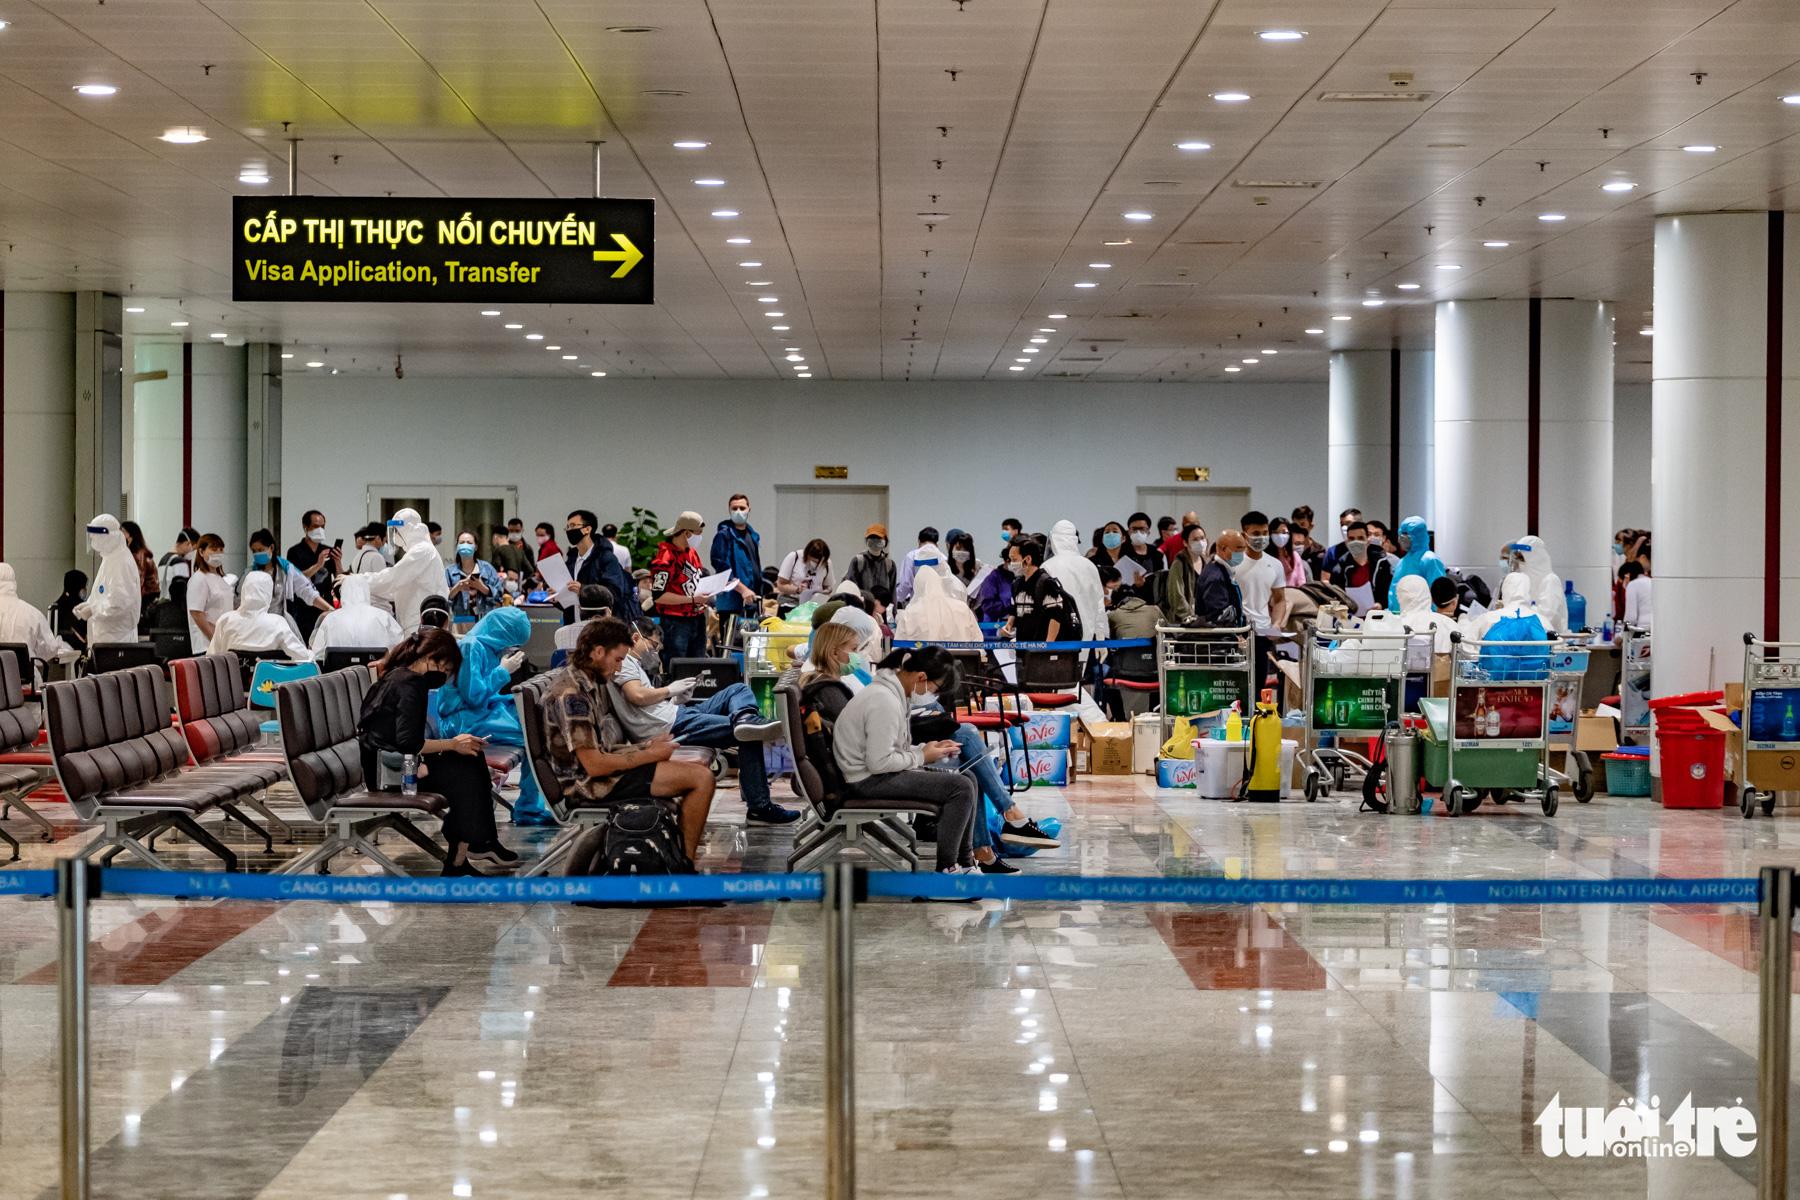 Passengers wait for their turn to make health declaration at Noi Bai International Airport in Hanoi, Vietnam, March 18, 2020. Photo: Nam Tran / Tuoi Tre Tre